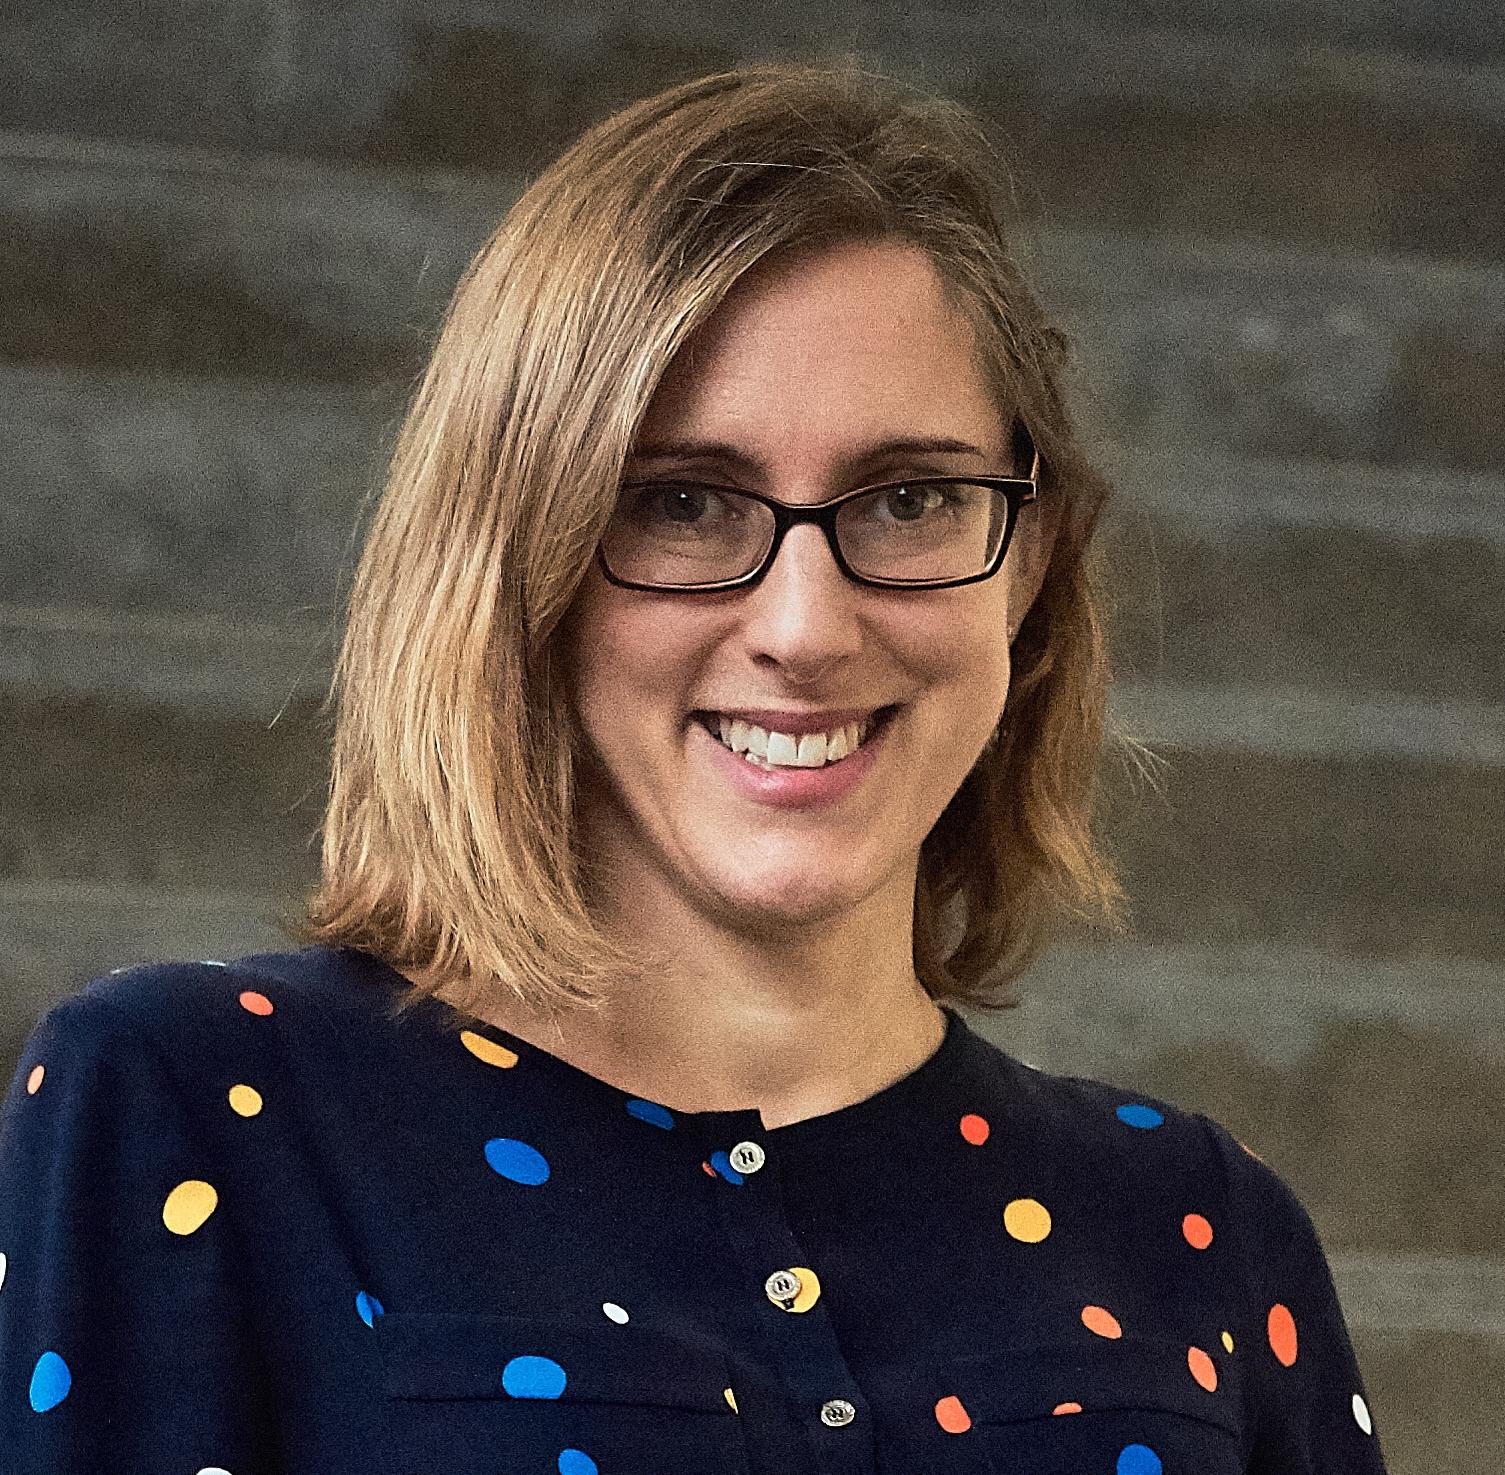 Professor Sarah-Jayne Blakemore